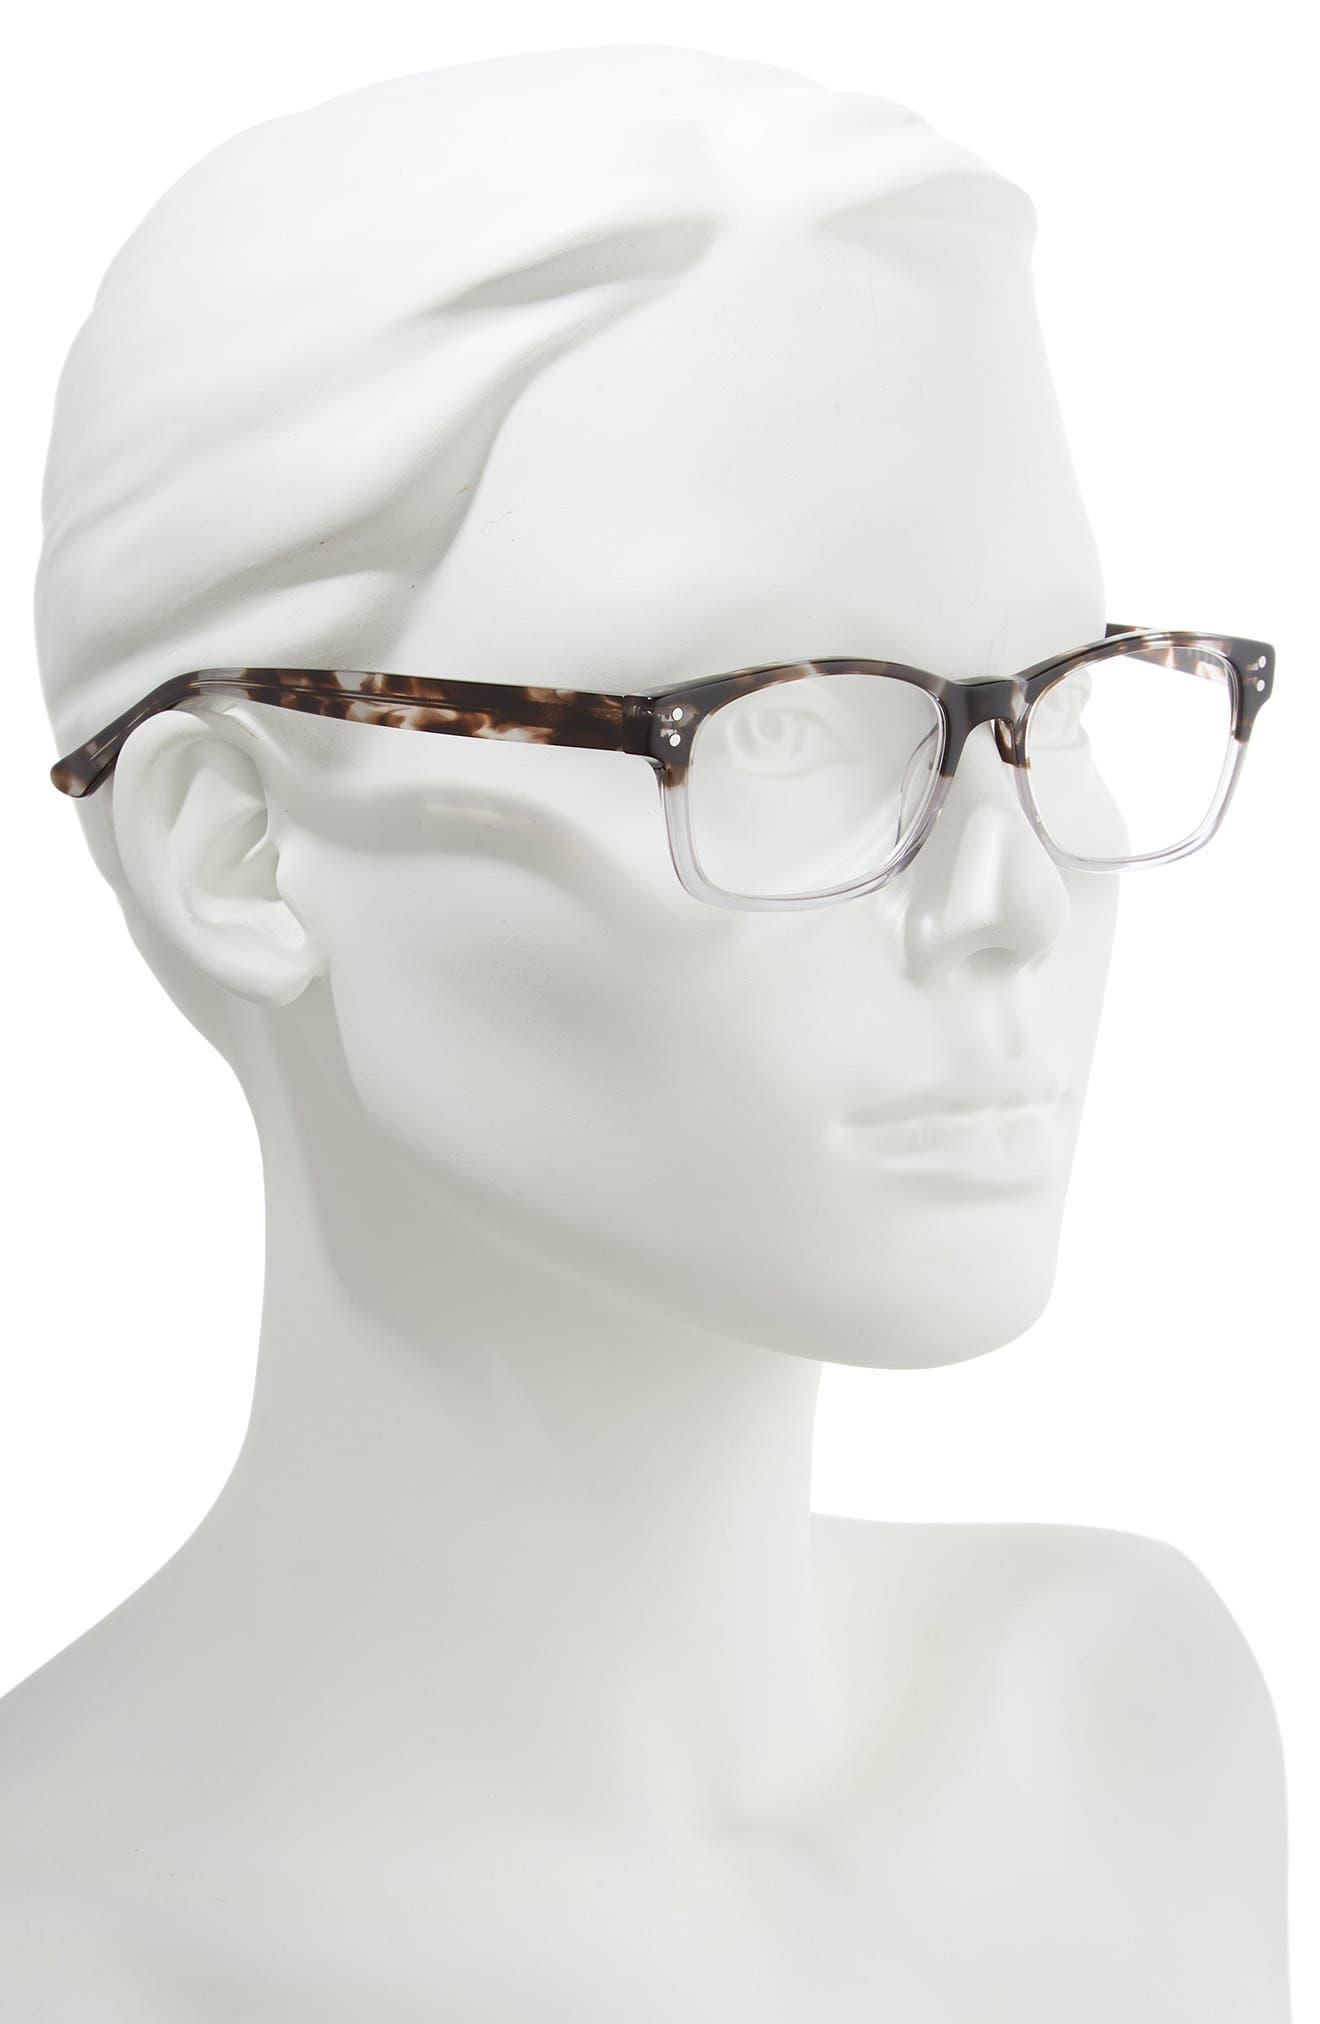 Edie 52mm Reading Glasses,                             Alternate thumbnail 2, color,                             GREY DEMI FADE